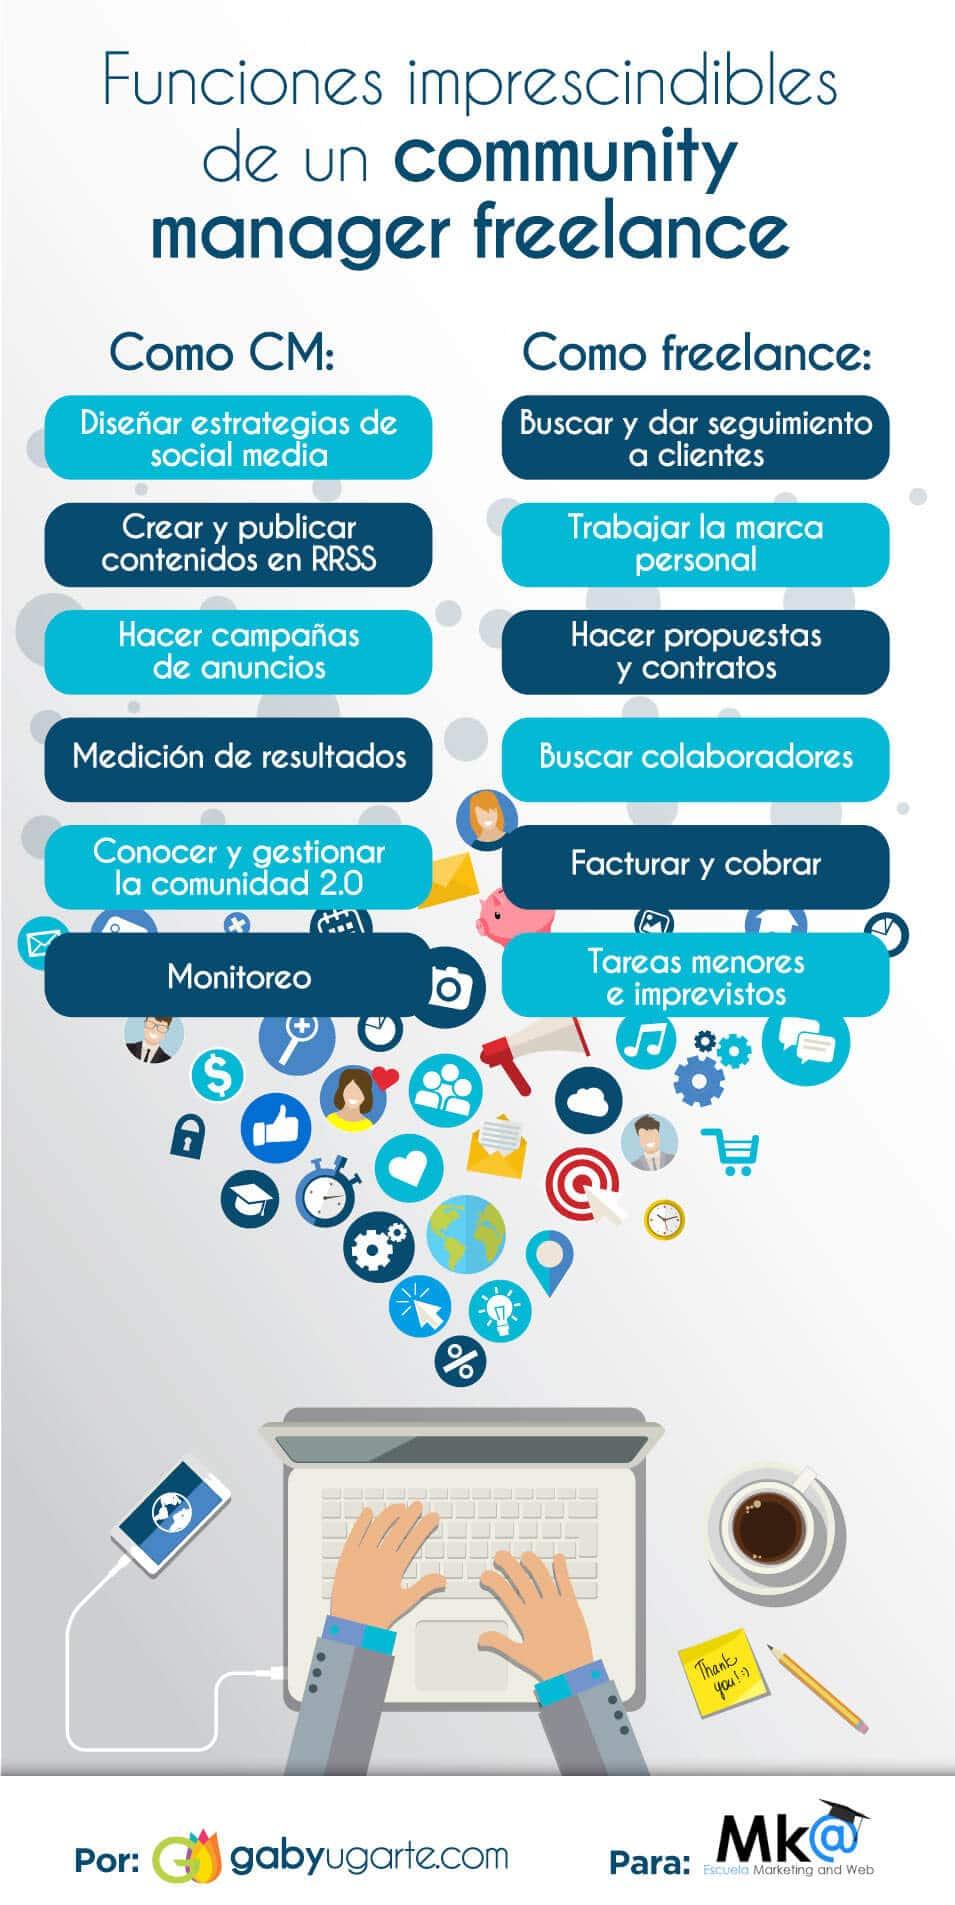 Funciones de un community manager freelance